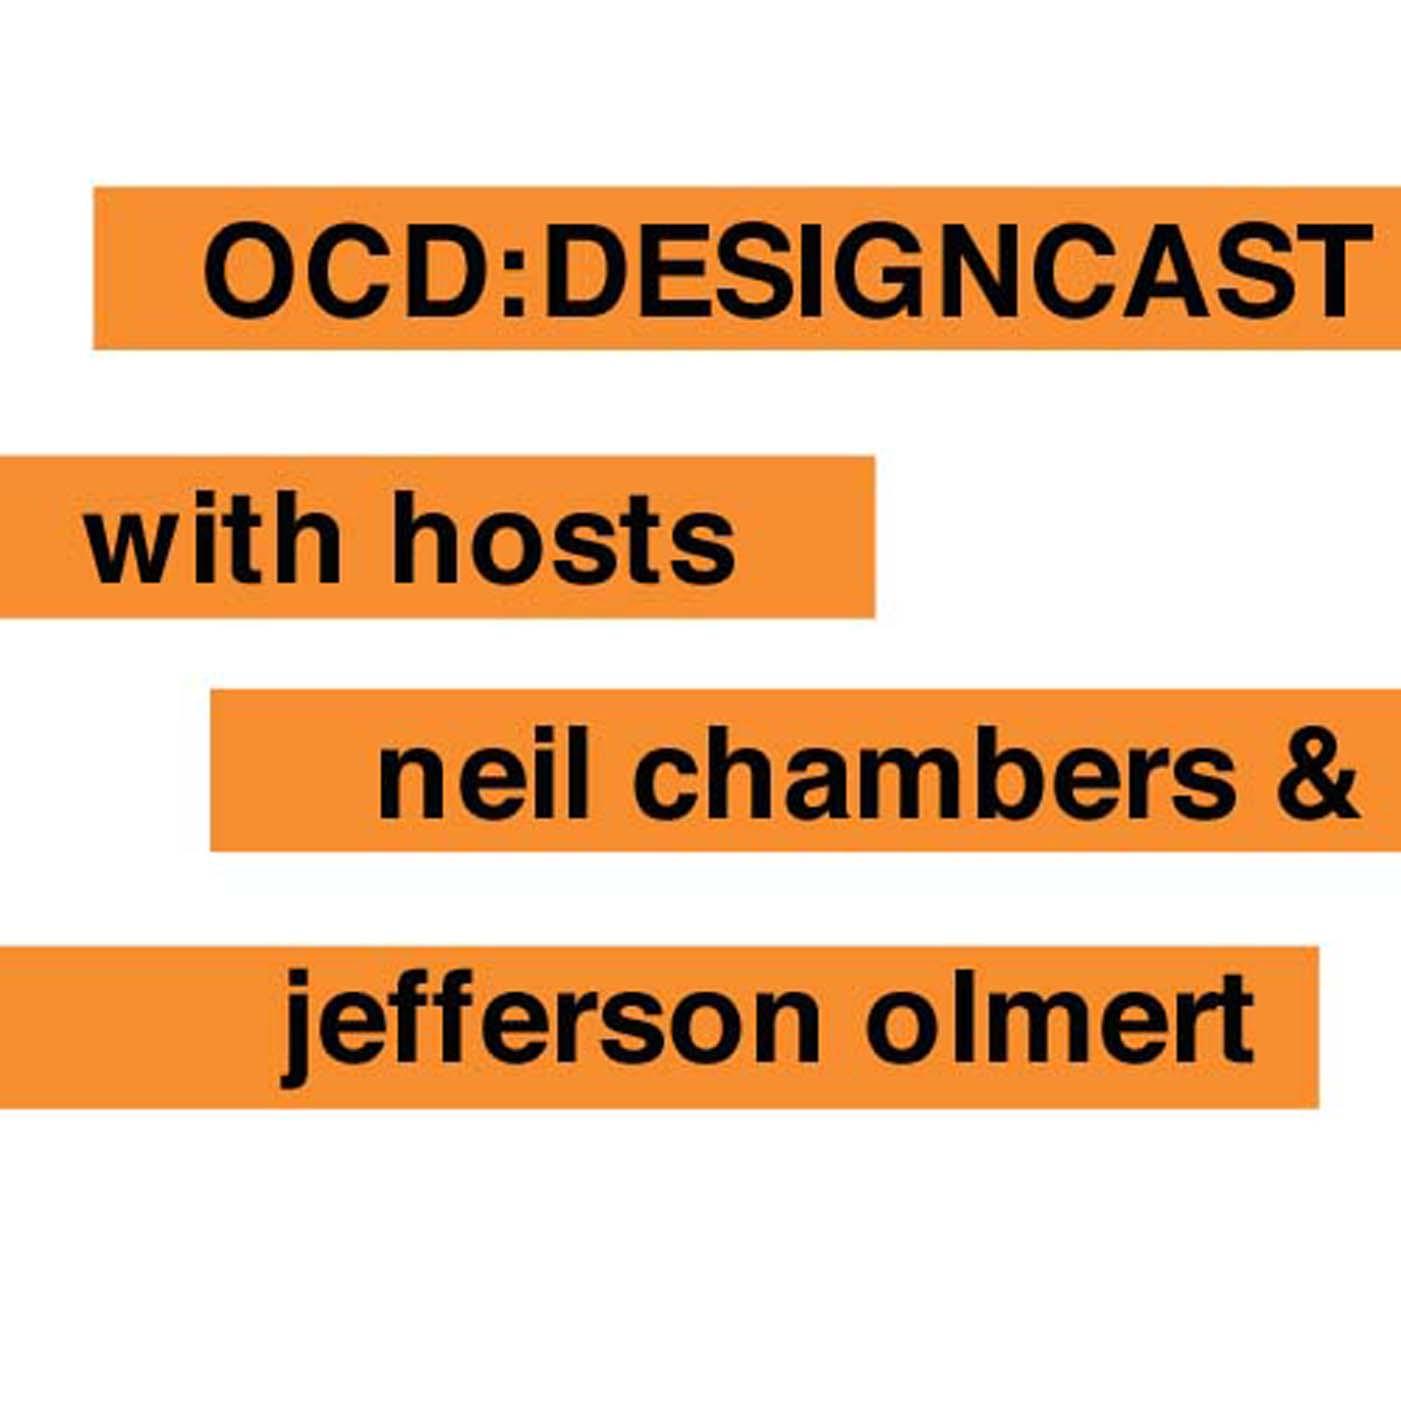 OCD:DESIGNCAST